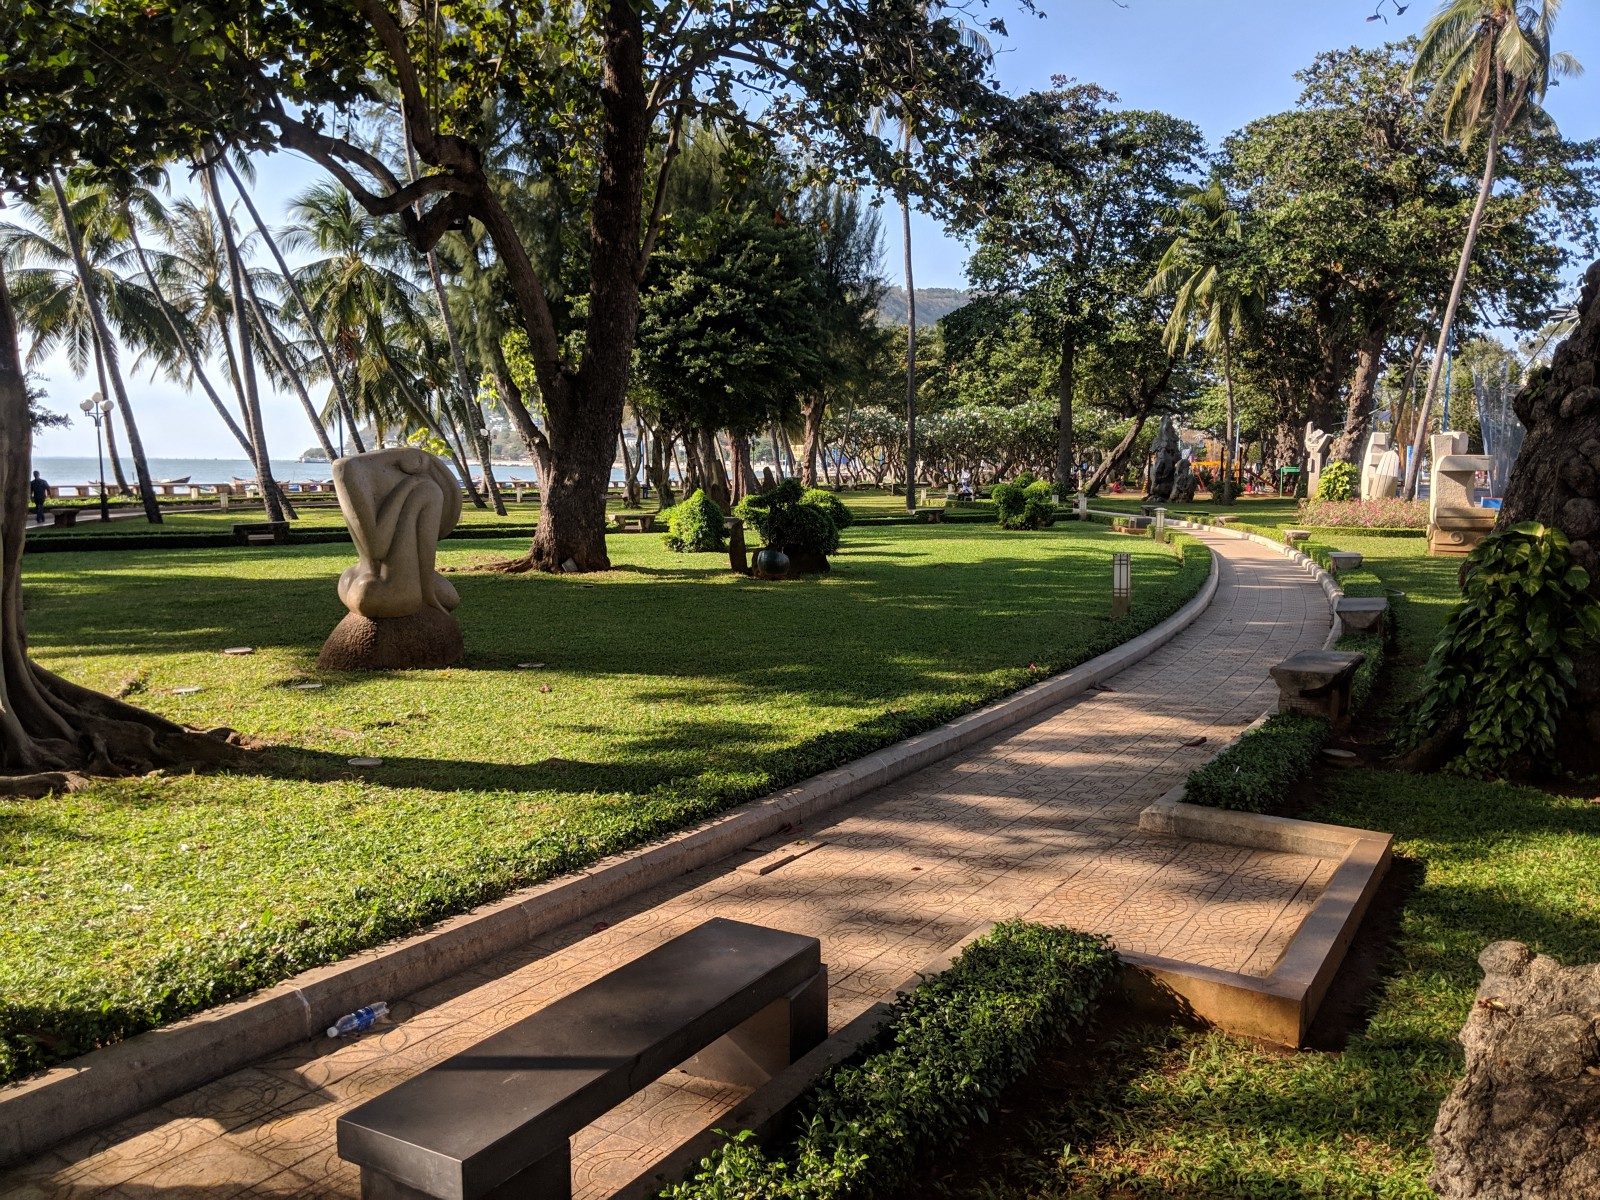 vung tau city park